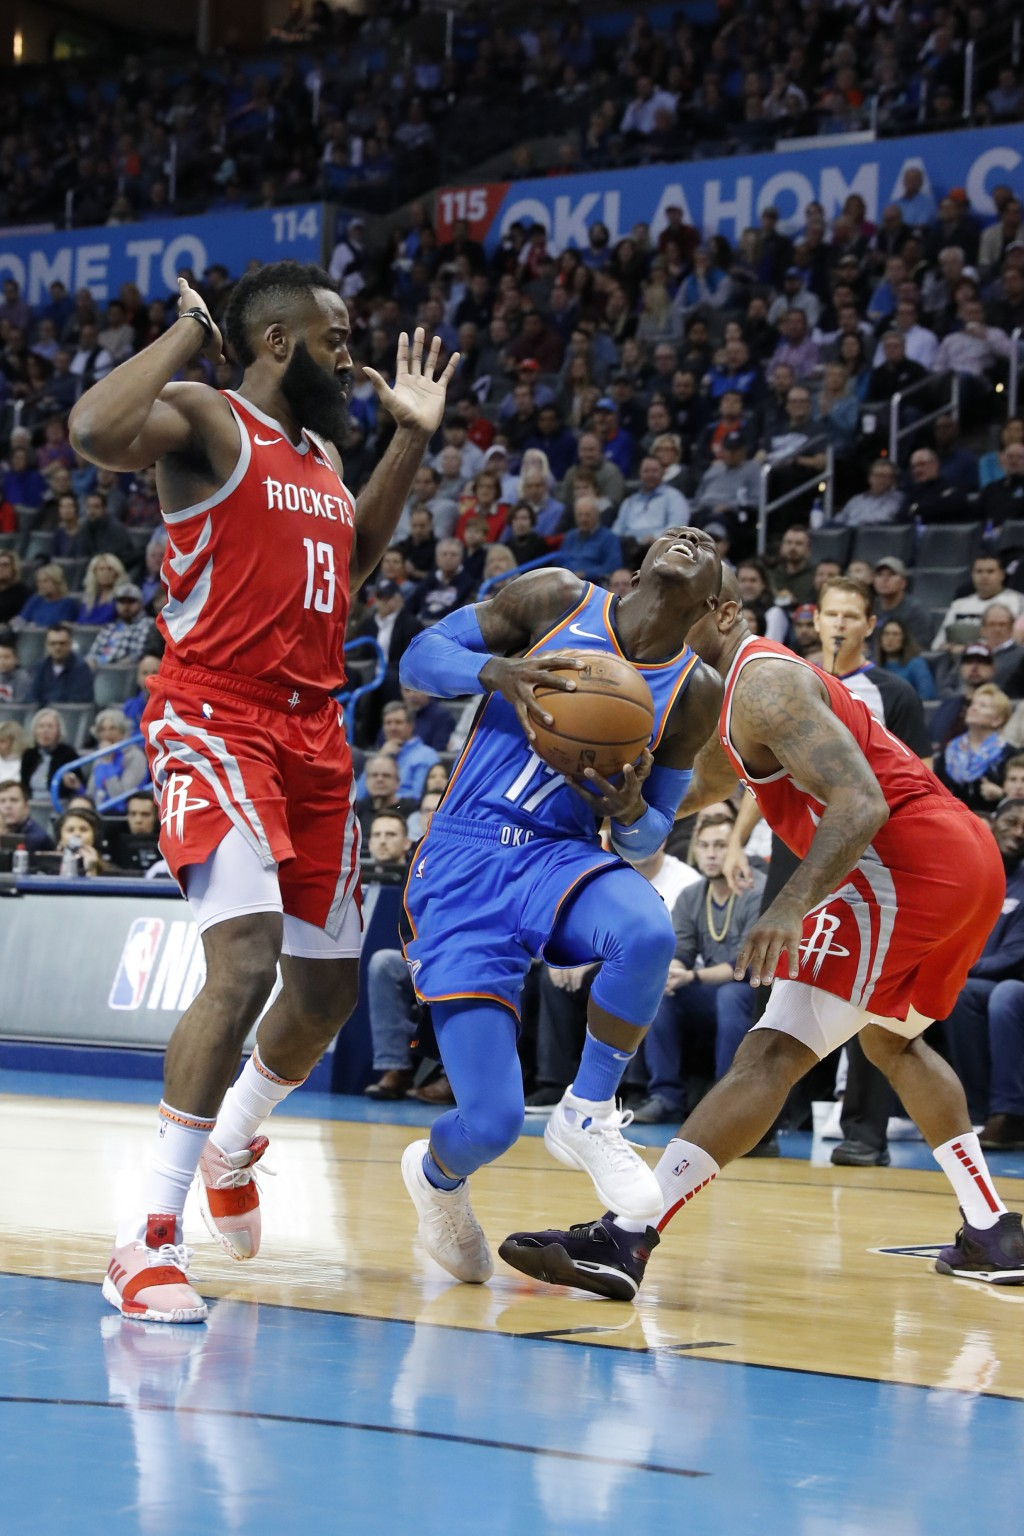 Oklahoma City Thunder forward Paul George (13) drives to the basket between Houston Rockets guard James Harden (13) and forward PJ Tucker (17) during